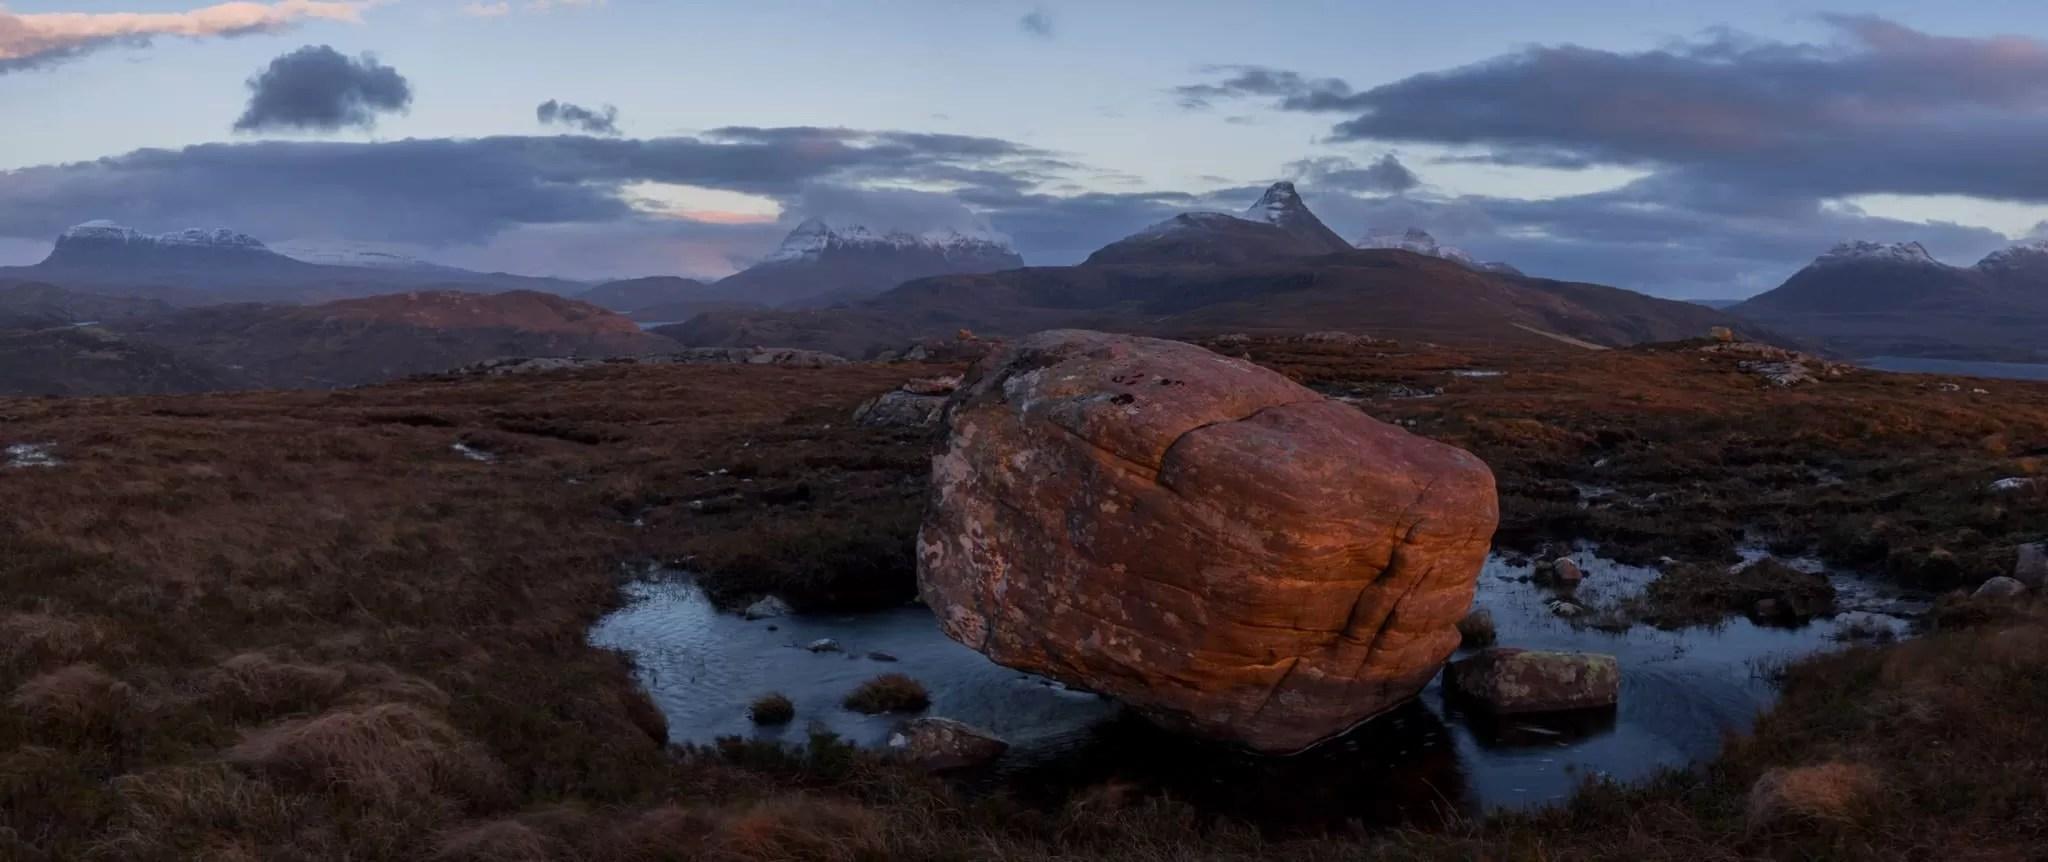 Torrodonian Sandstone - Scotland Photography Workshops